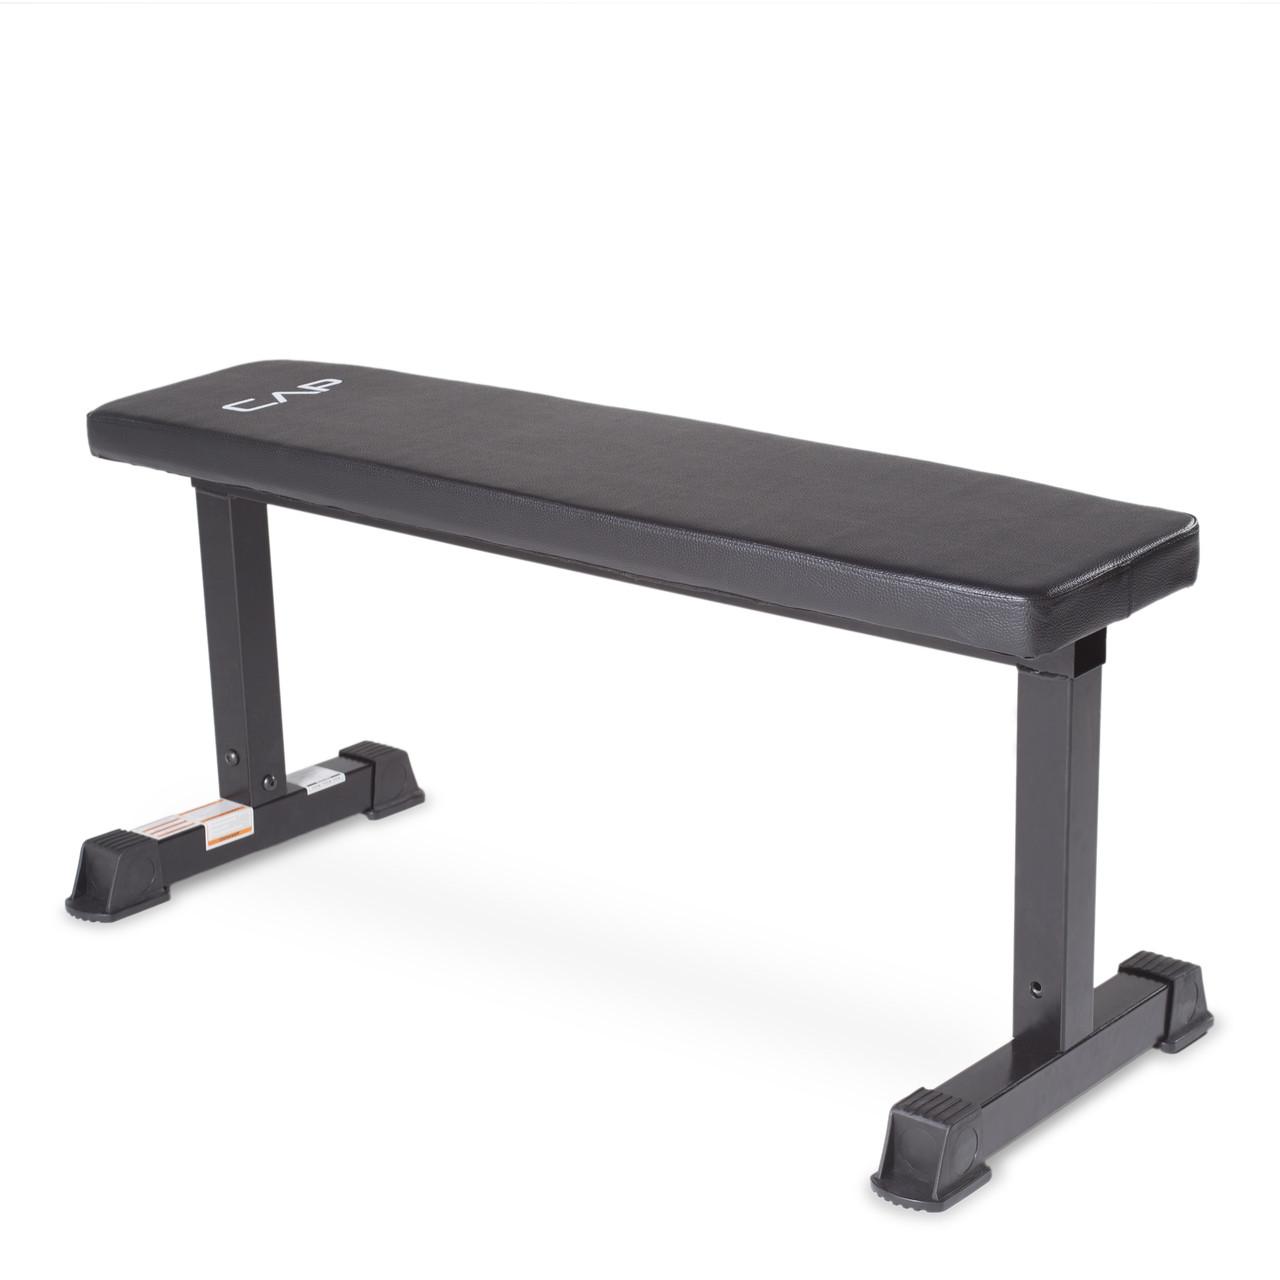 Enjoyable Cap Strength Flat Bench Black Fm 703B Creativecarmelina Interior Chair Design Creativecarmelinacom